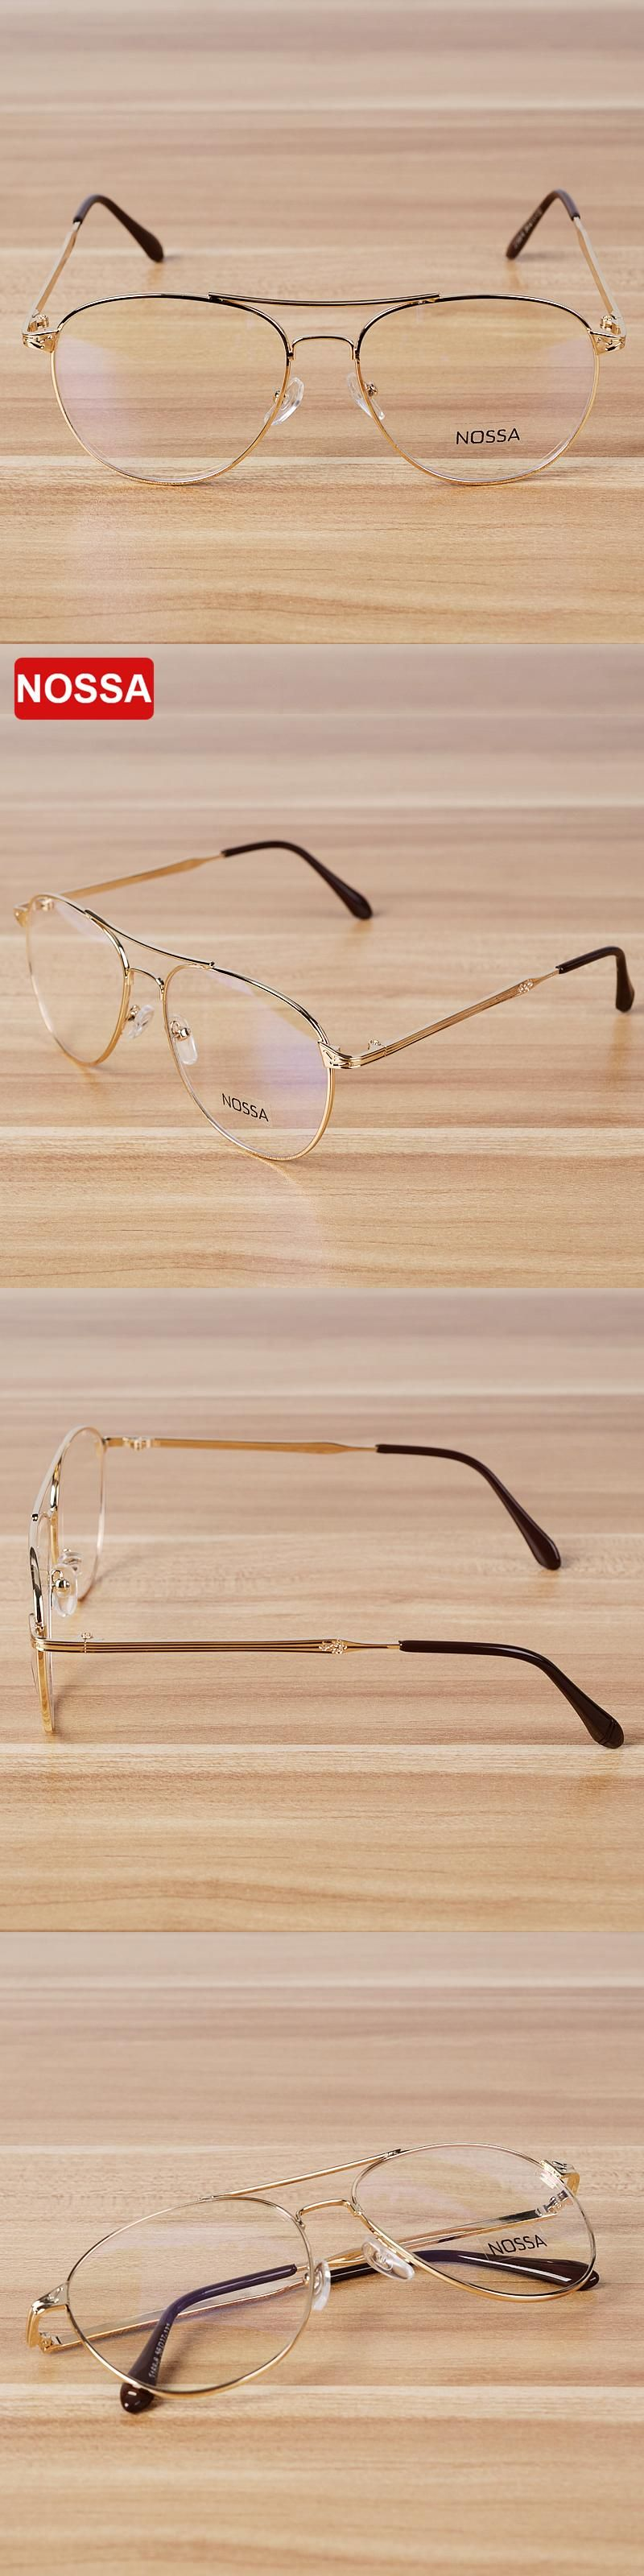 b68997a1190 NOSSA Brand Quality Metal Glasses Frame Myopia Alloy Glasses Frames Men  Women s Eyeglasses Spectacle Frame Big